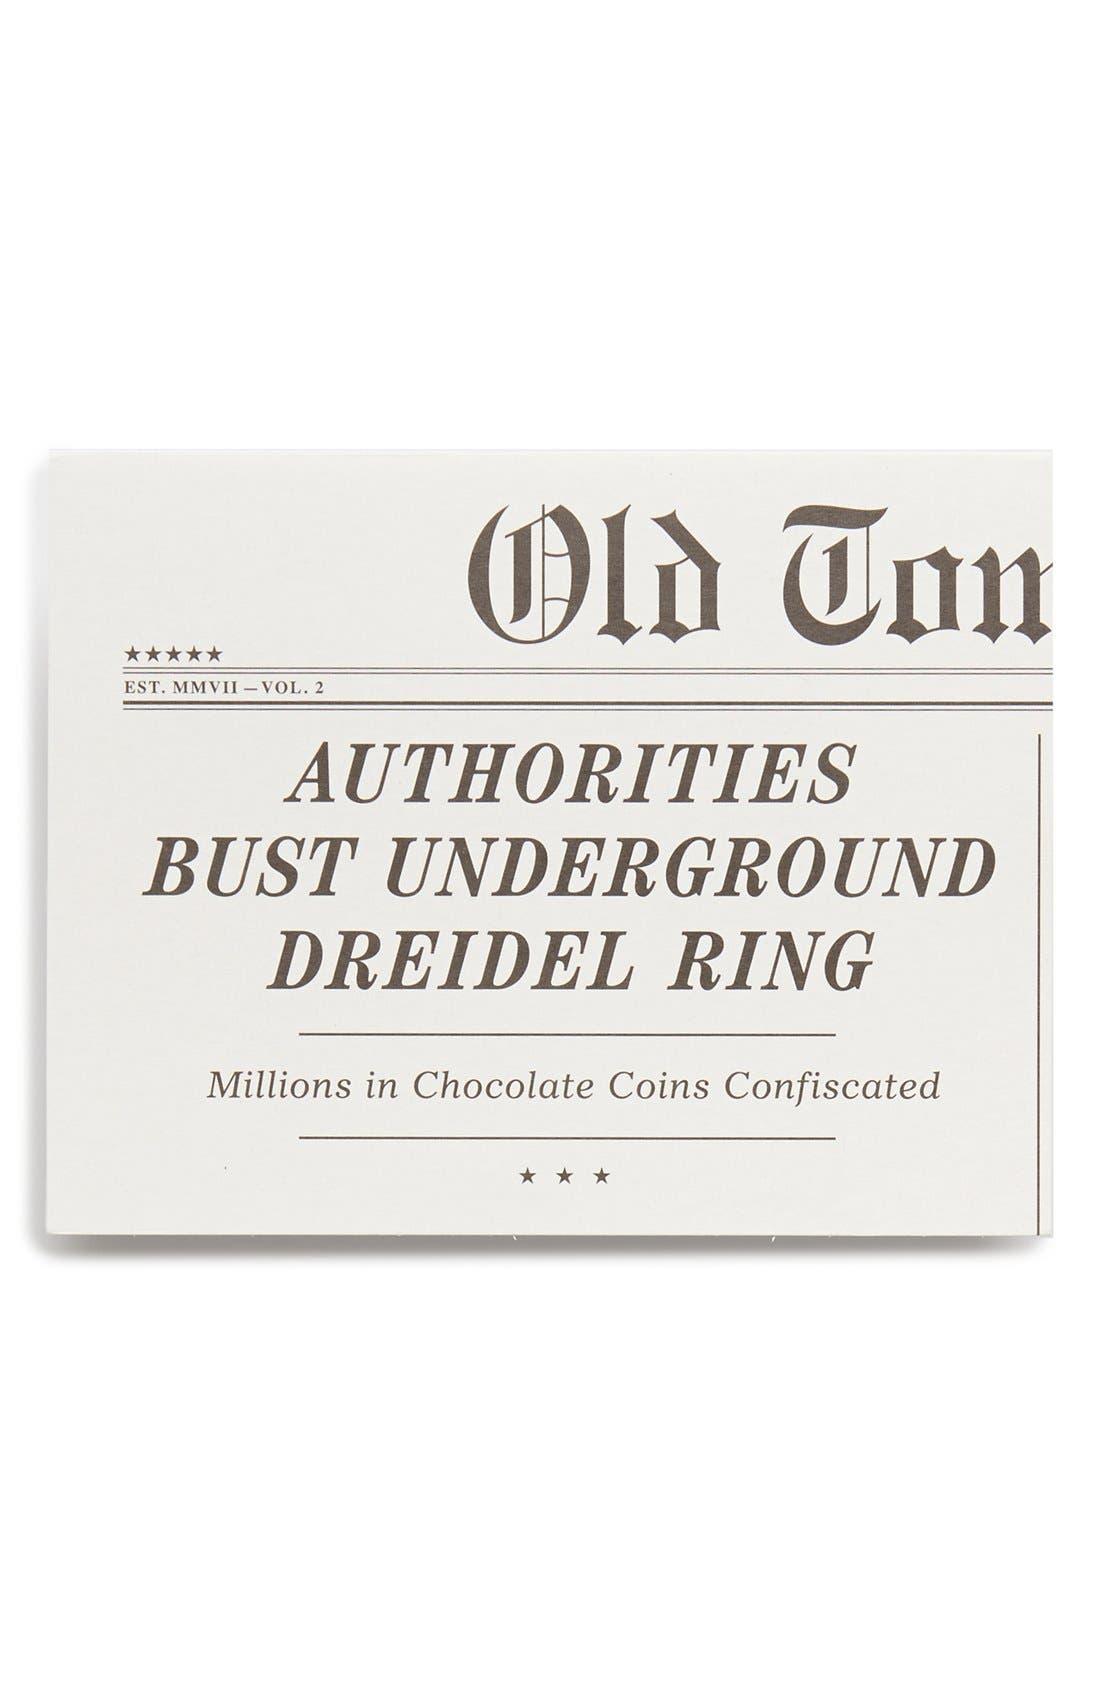 Alternate Image 1 Selected - Old Tom Foolery 'Dreidel Ring' Card